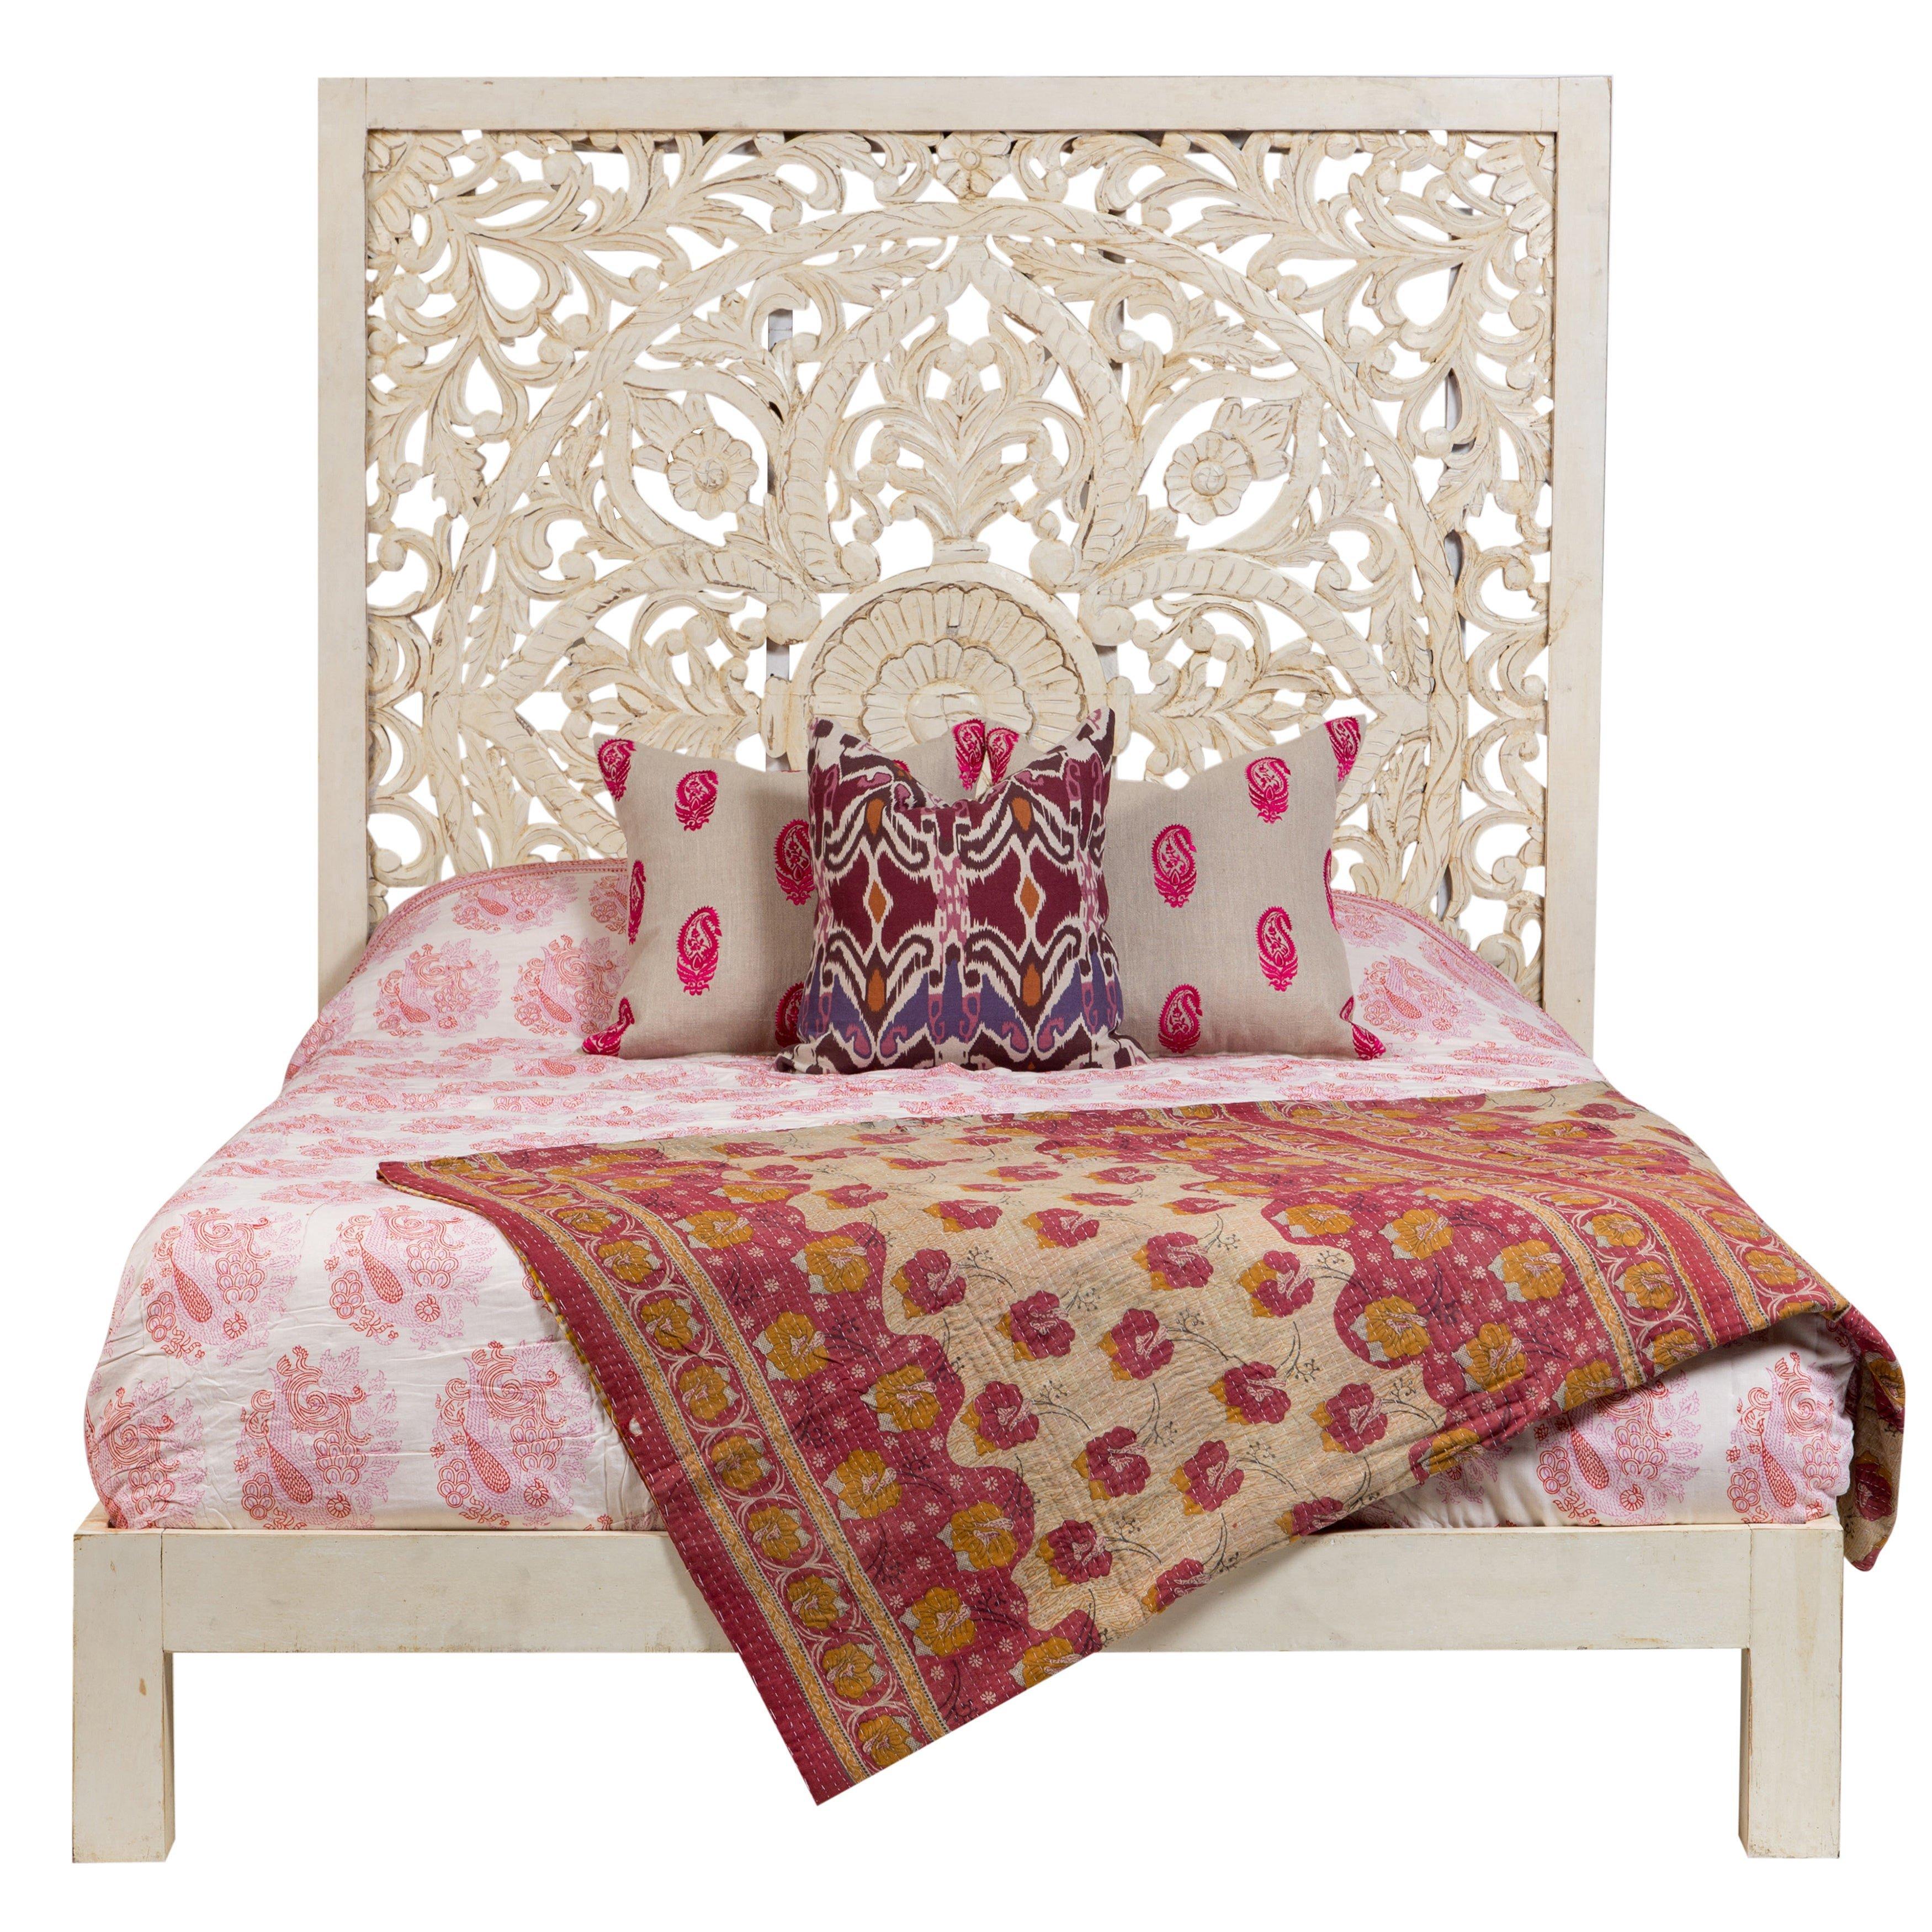 Ashley Porter Bedroom Set Fresh Wanderloot Bali Handmade Floral Medallion White Painted Mango Queen Panel Bed India